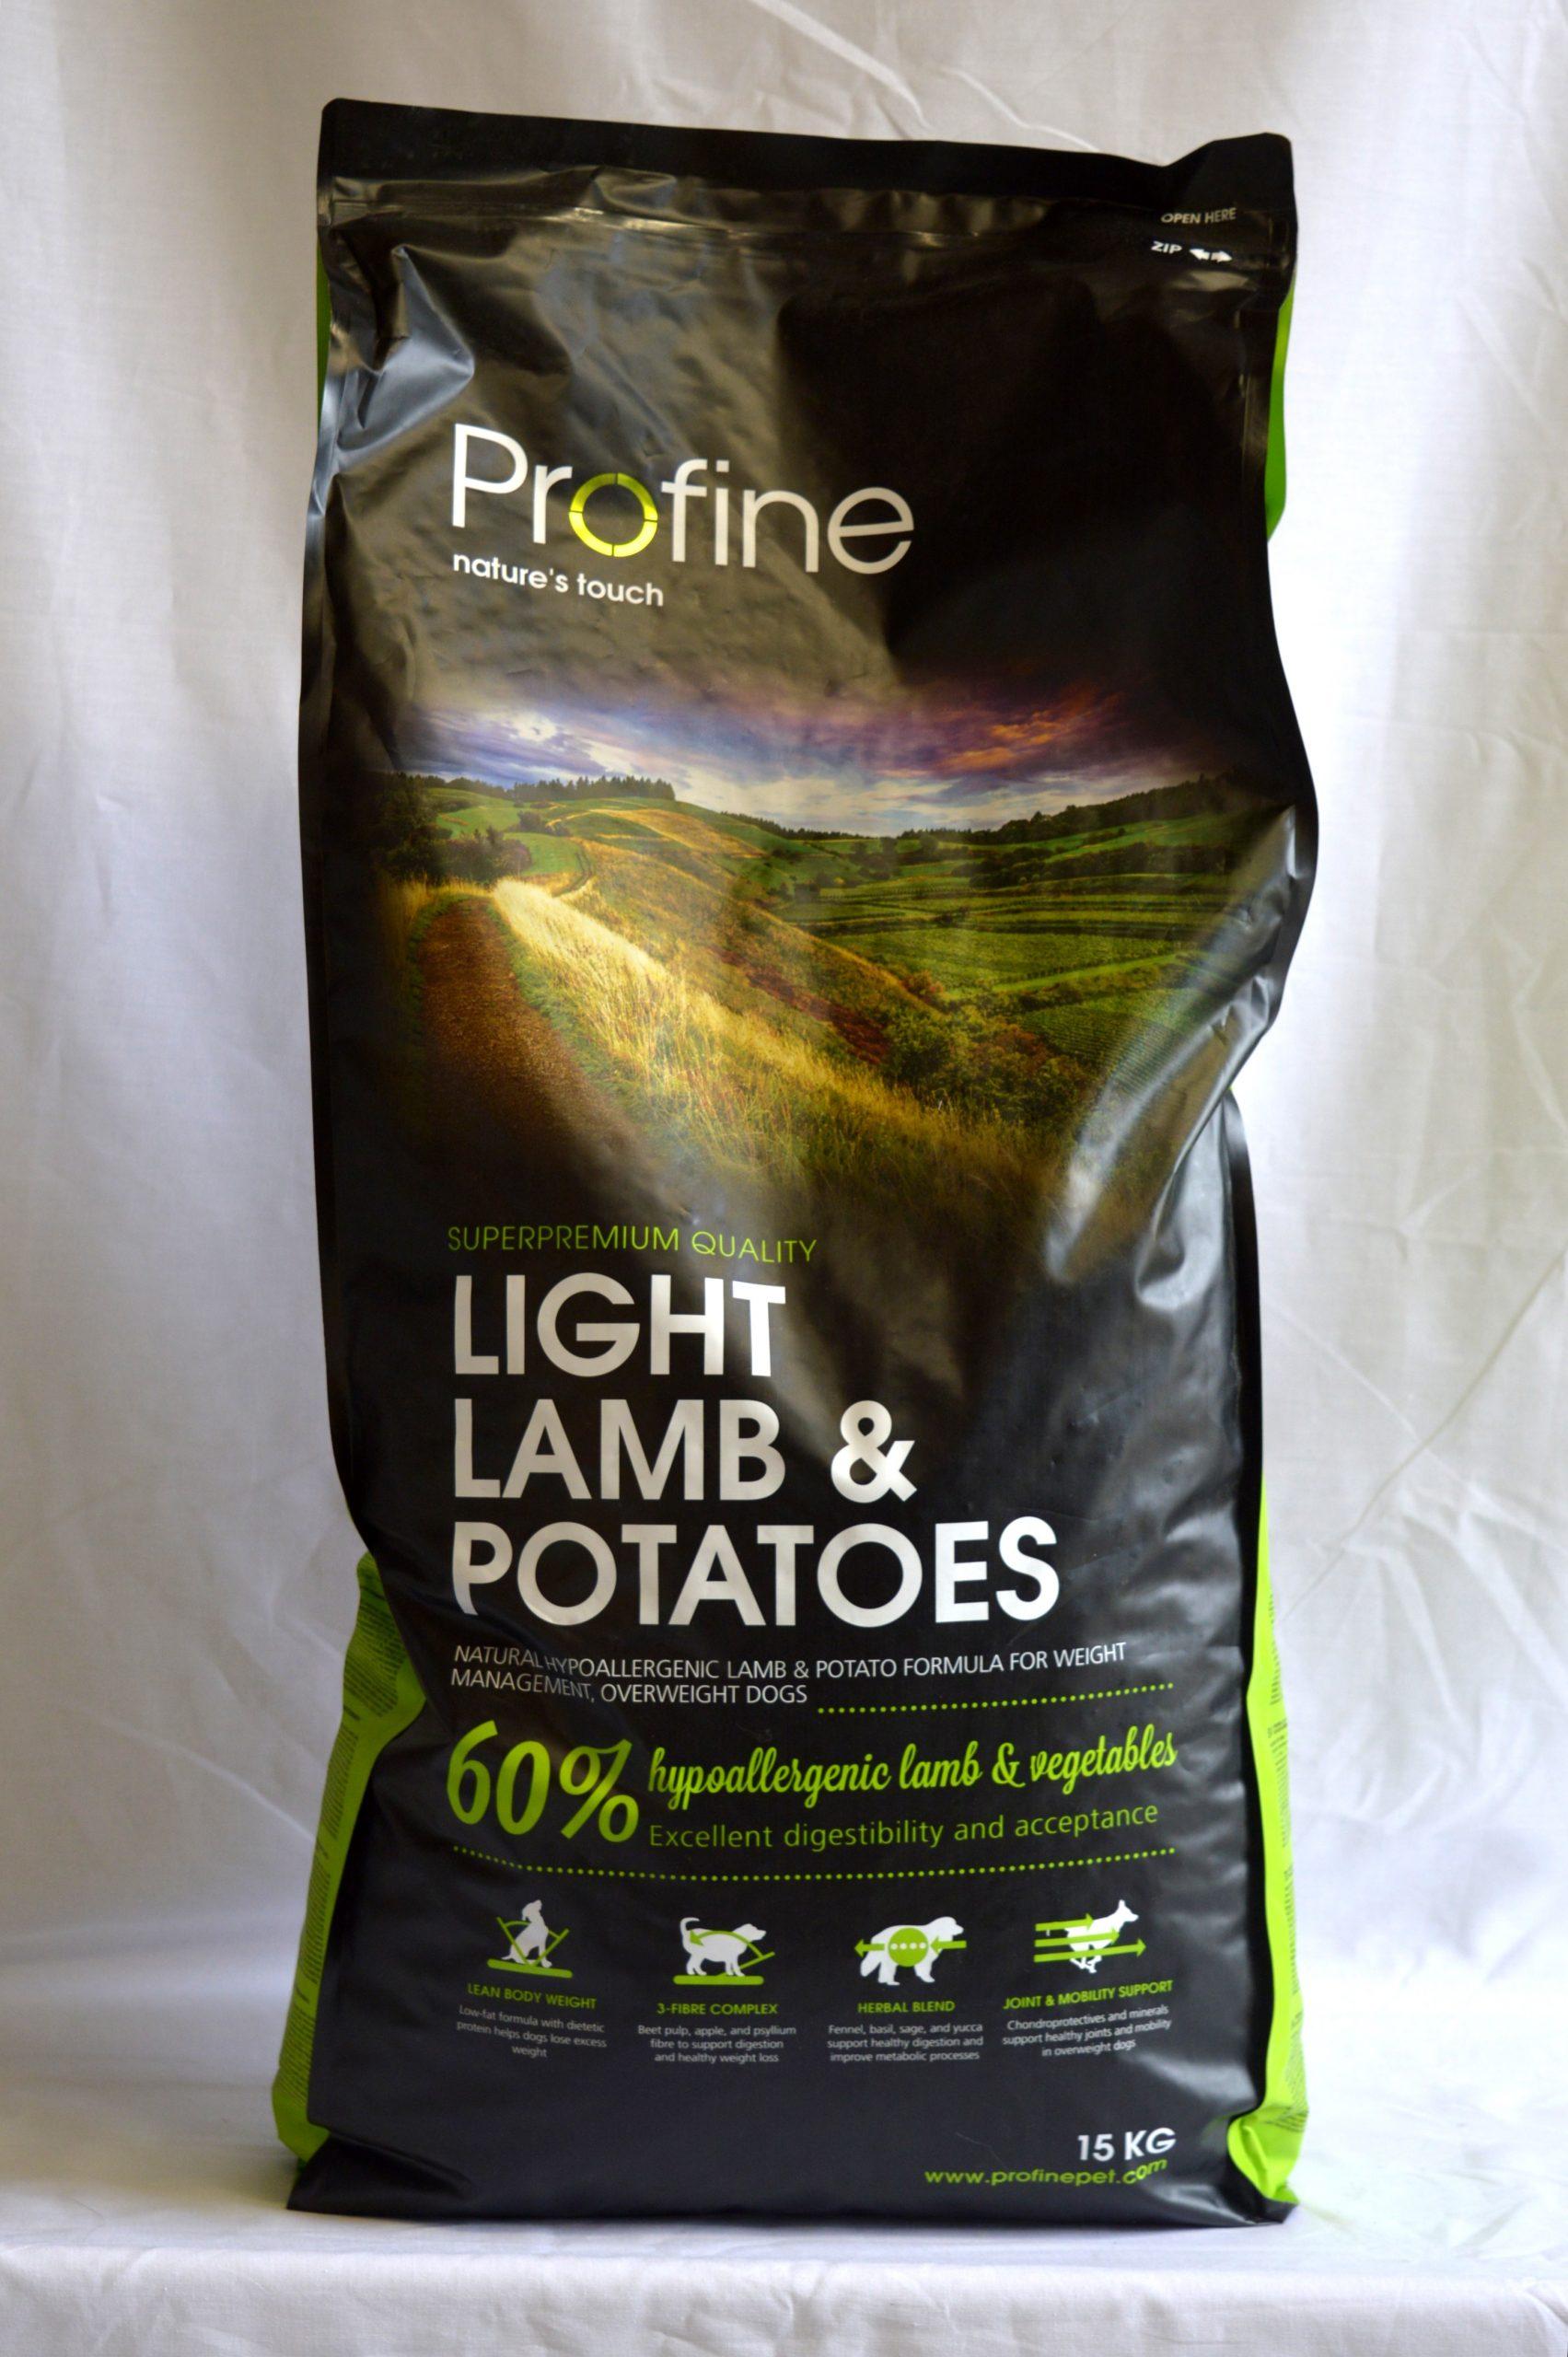 Profine Lamb & Potatoes Light-15kg